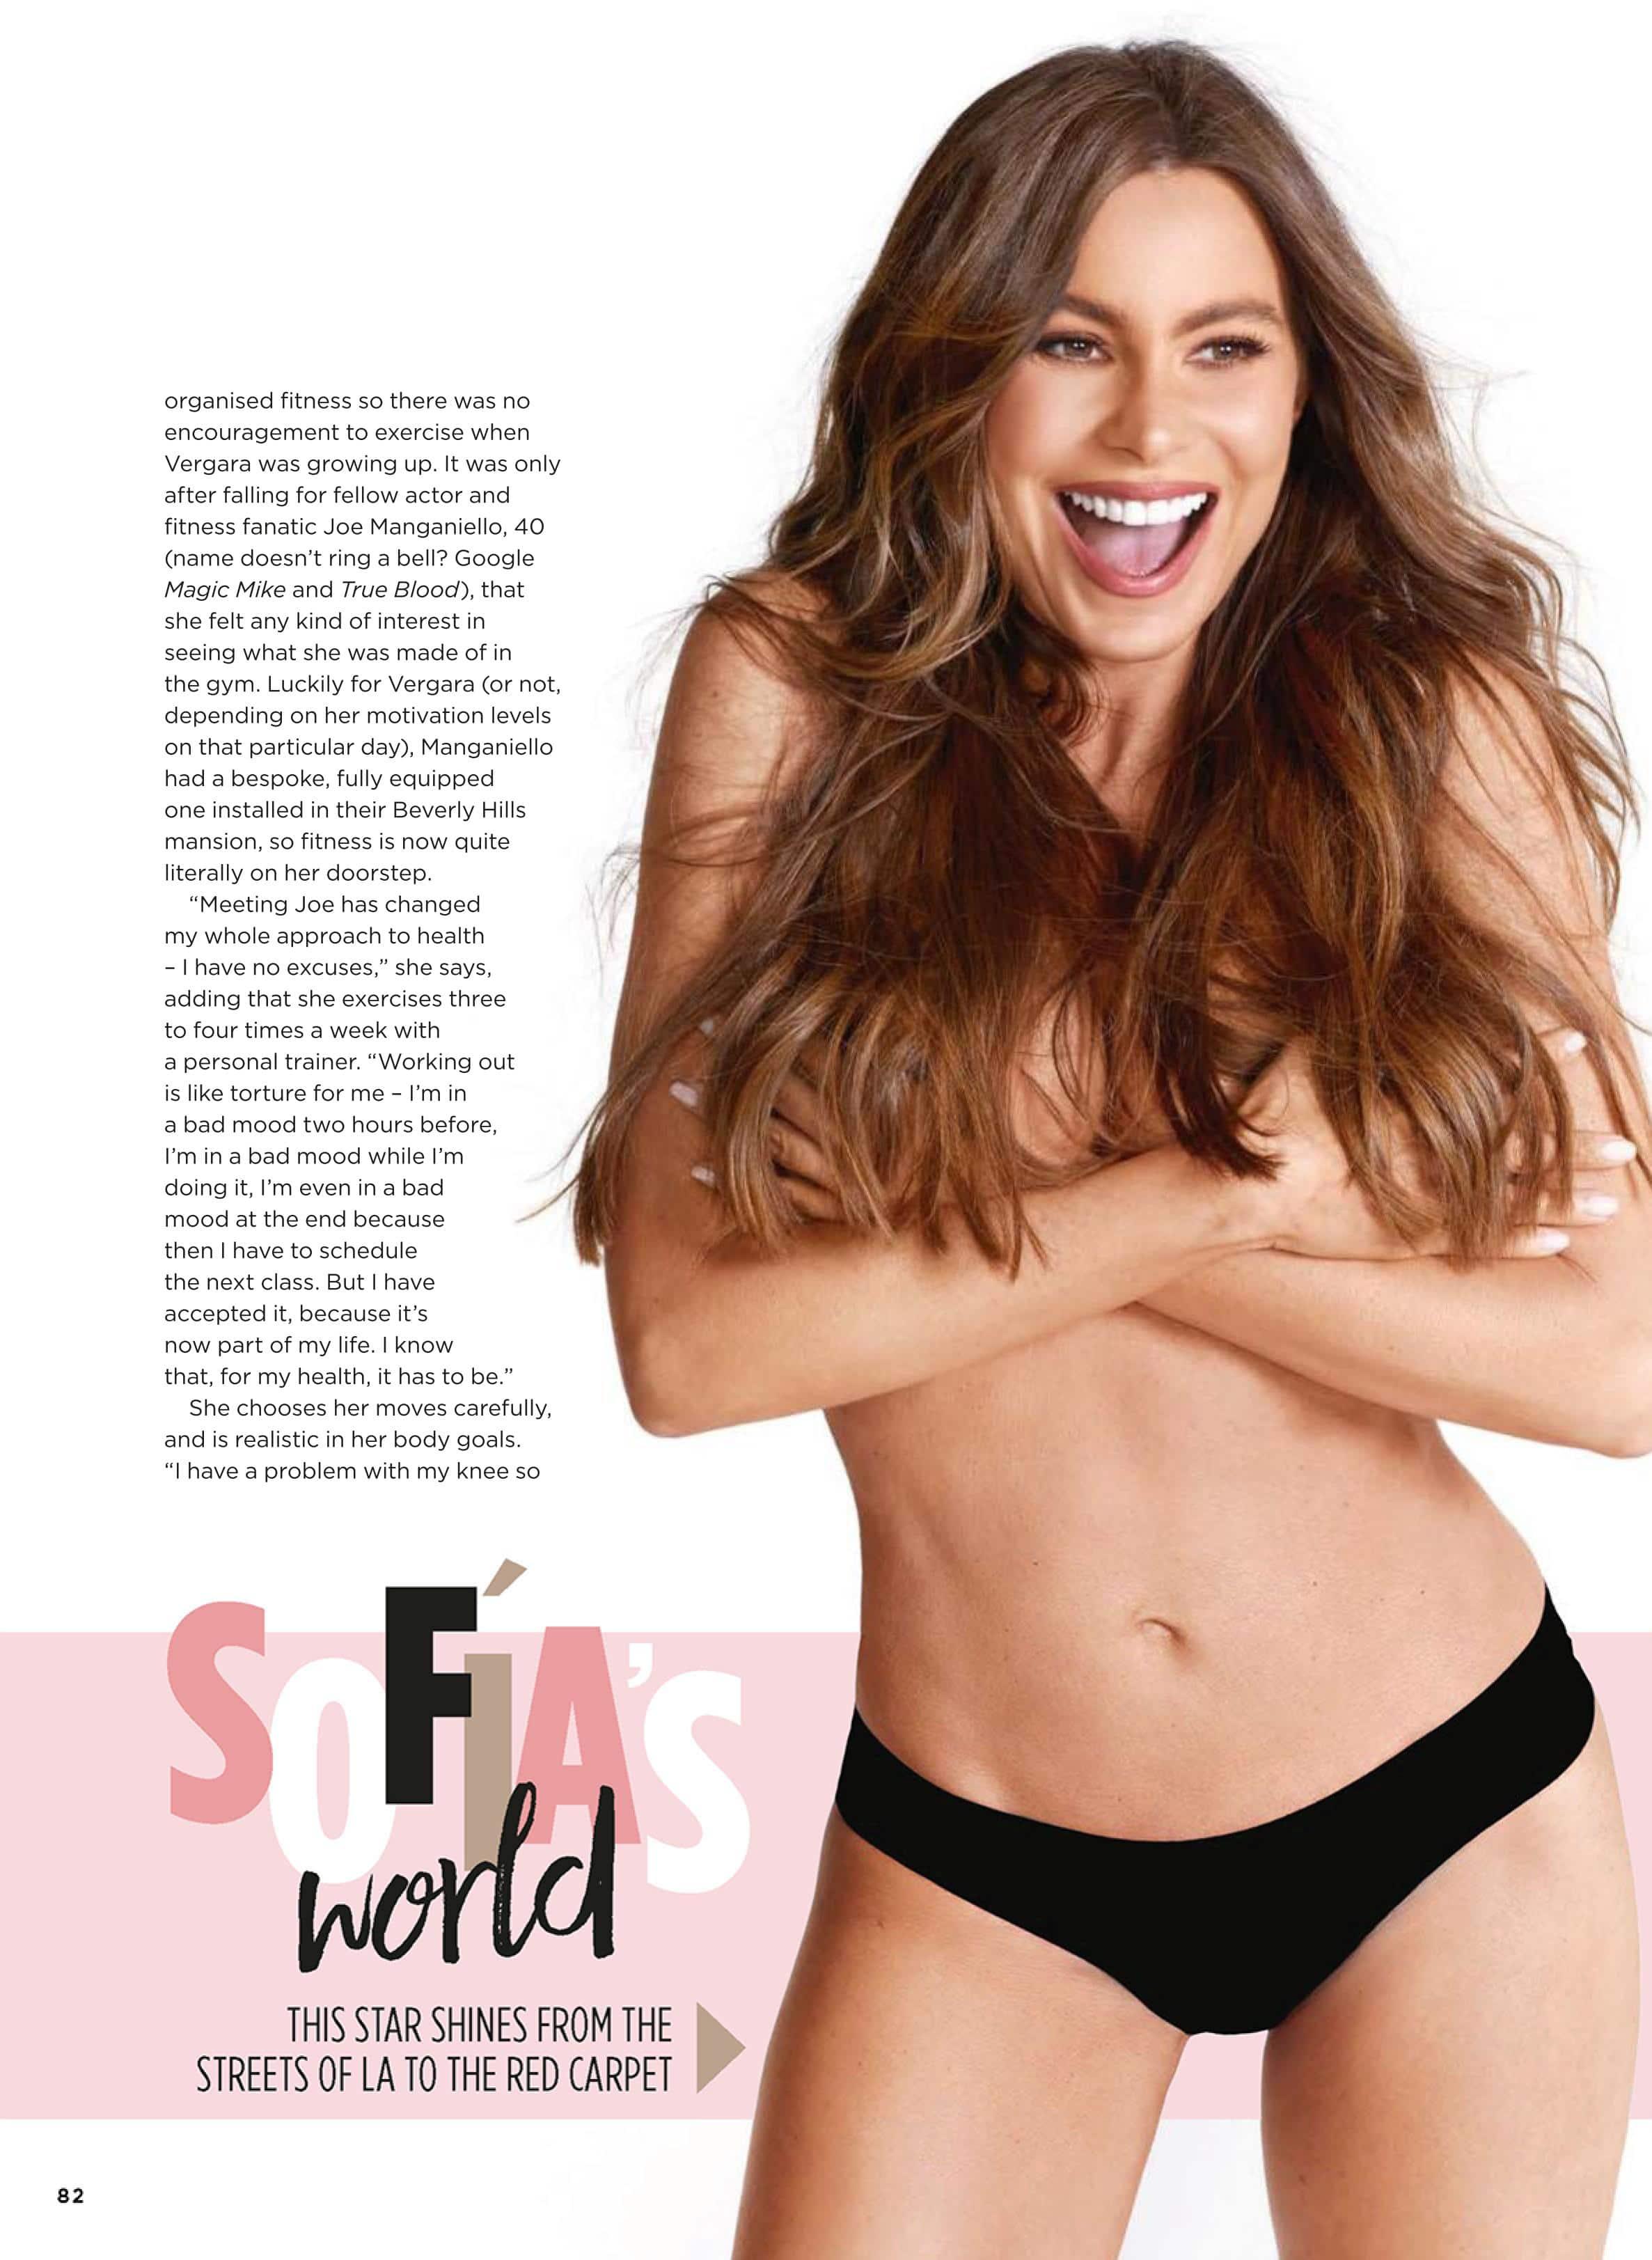 Sofia Vergara magazine